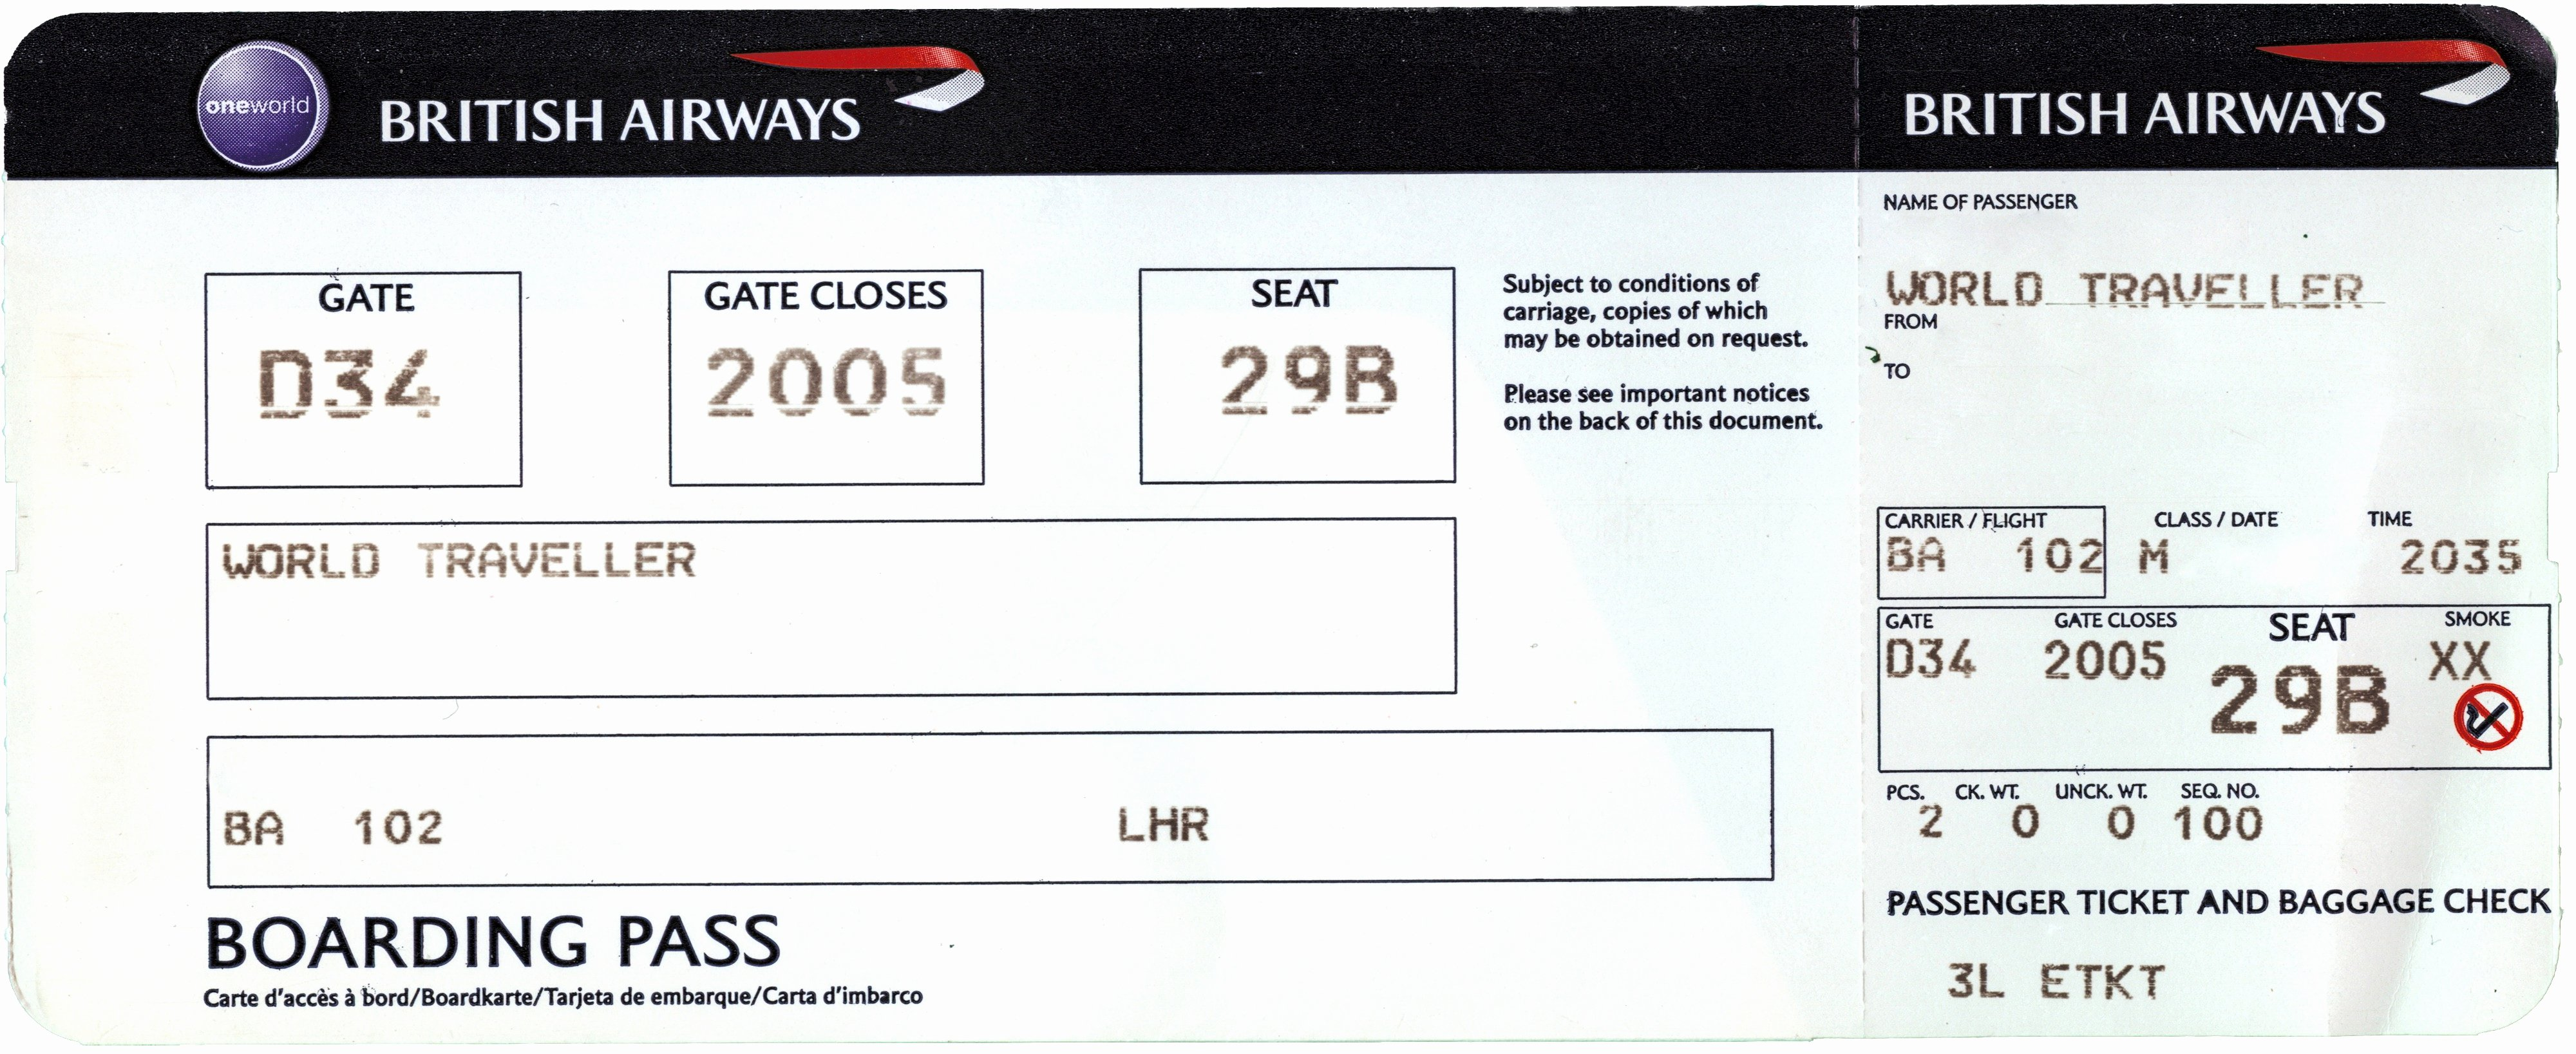 Fake Plane Ticket Template Portablegasgrillweber